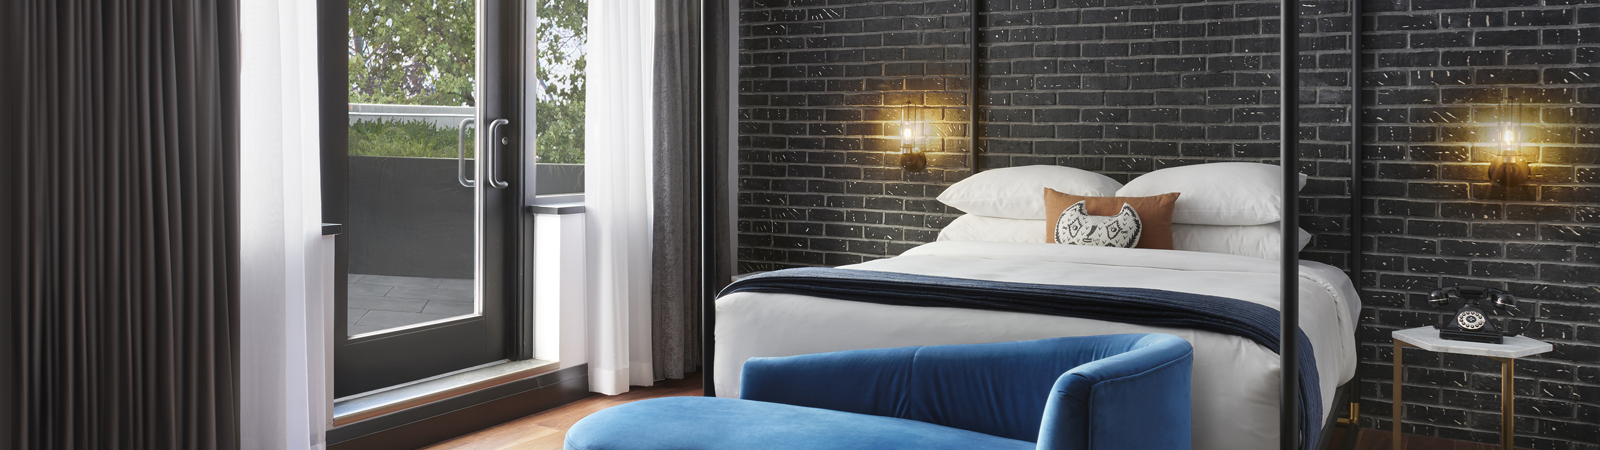 TORJD_P010_The_Apartment_Bedroom